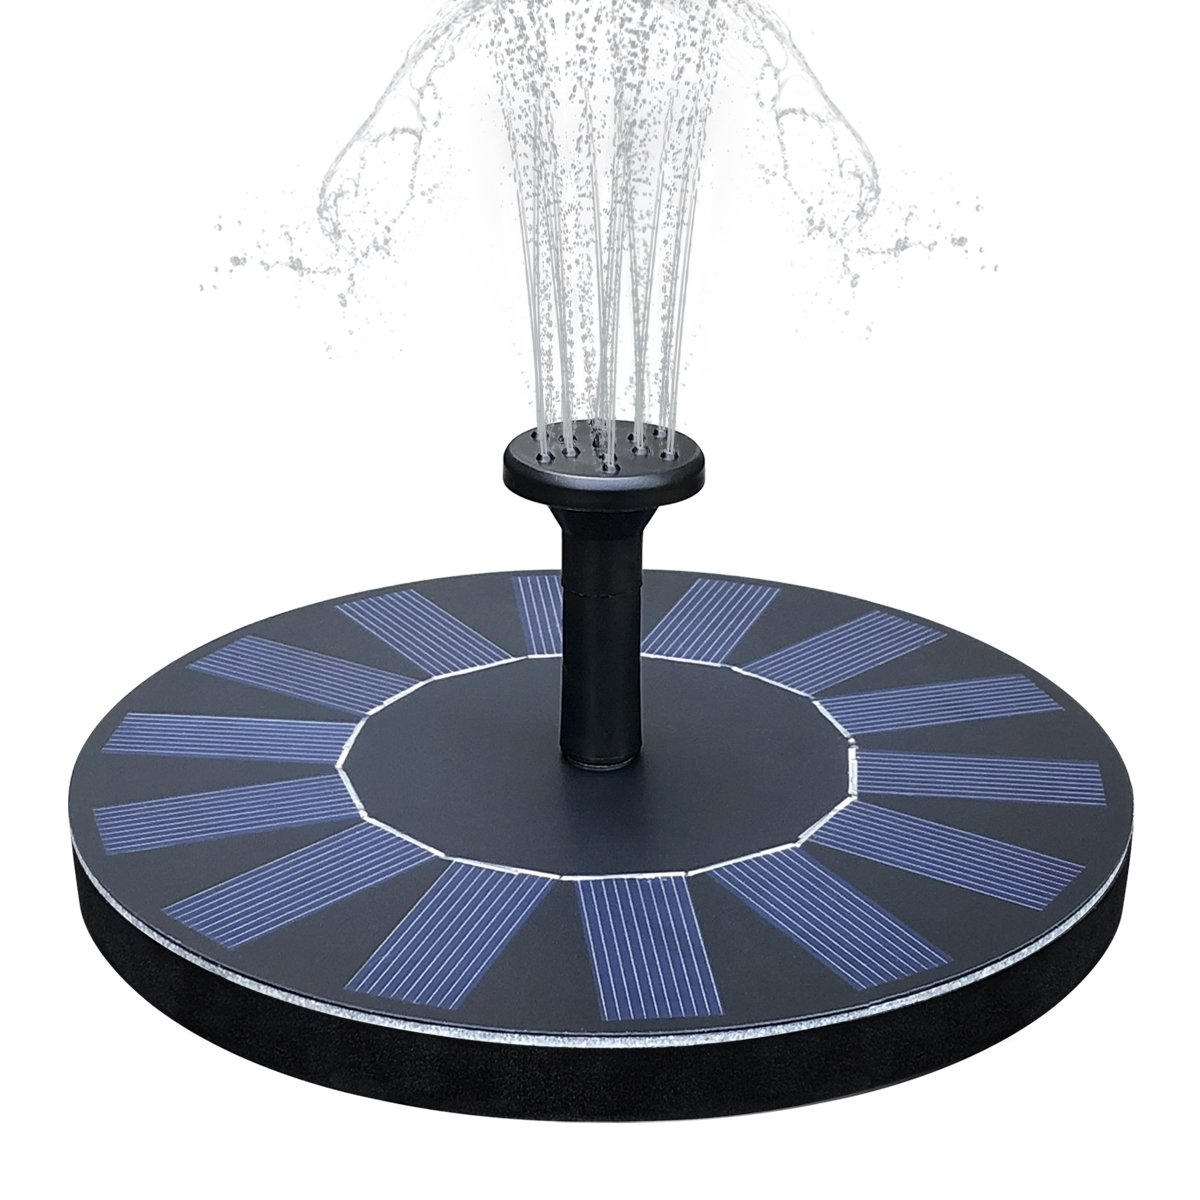 Feelle Solar Powered Bird Bath Fountain Pump 1.4W Solar Panel Fountain Kit, Outdoor Floating Submersible Water Fountain Pump for Pond, Pool, Garden, Fish Tank, Aquarium